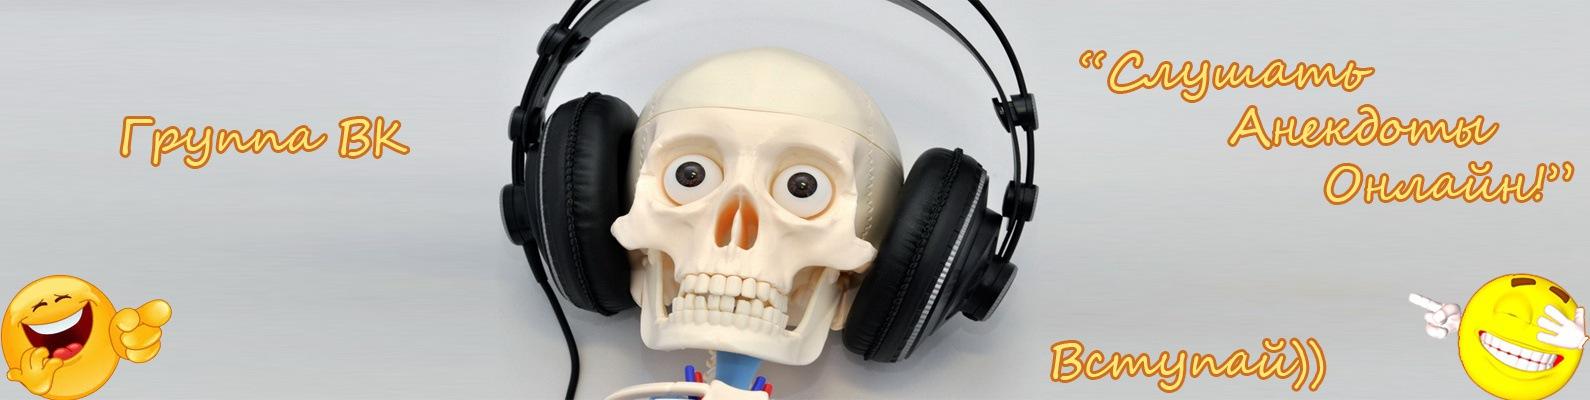 Аудио Анекдот Про